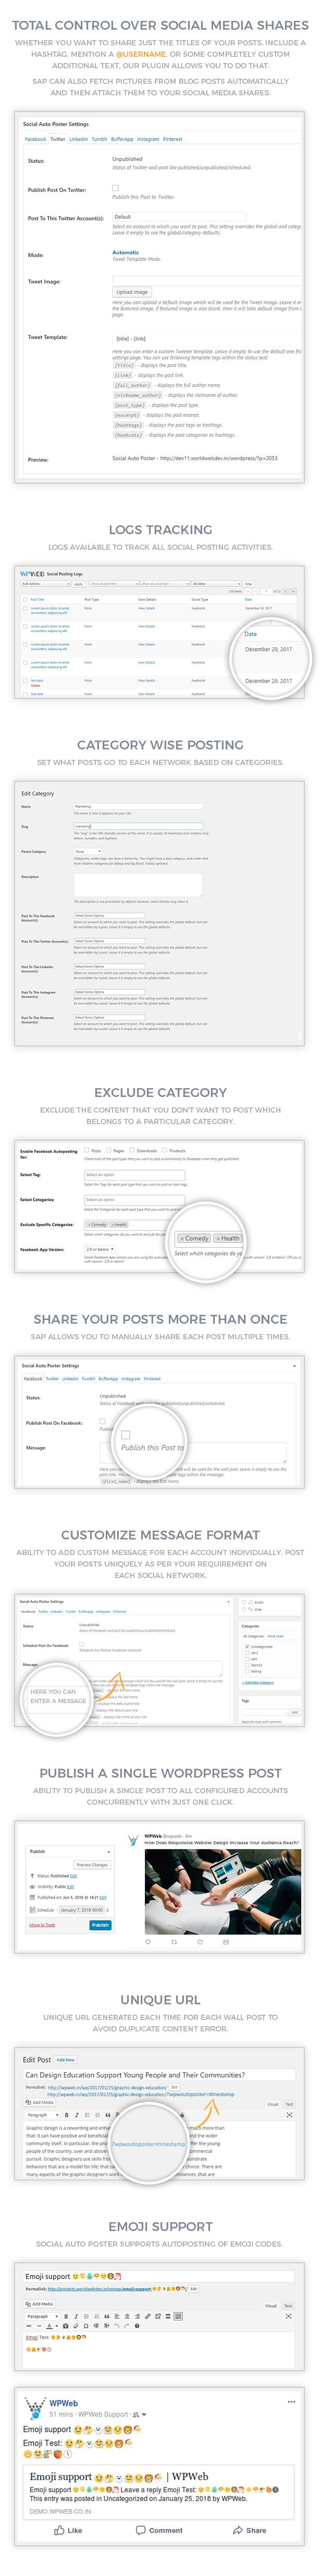 social4 2 - Social Auto Poster - WordPress Plugin